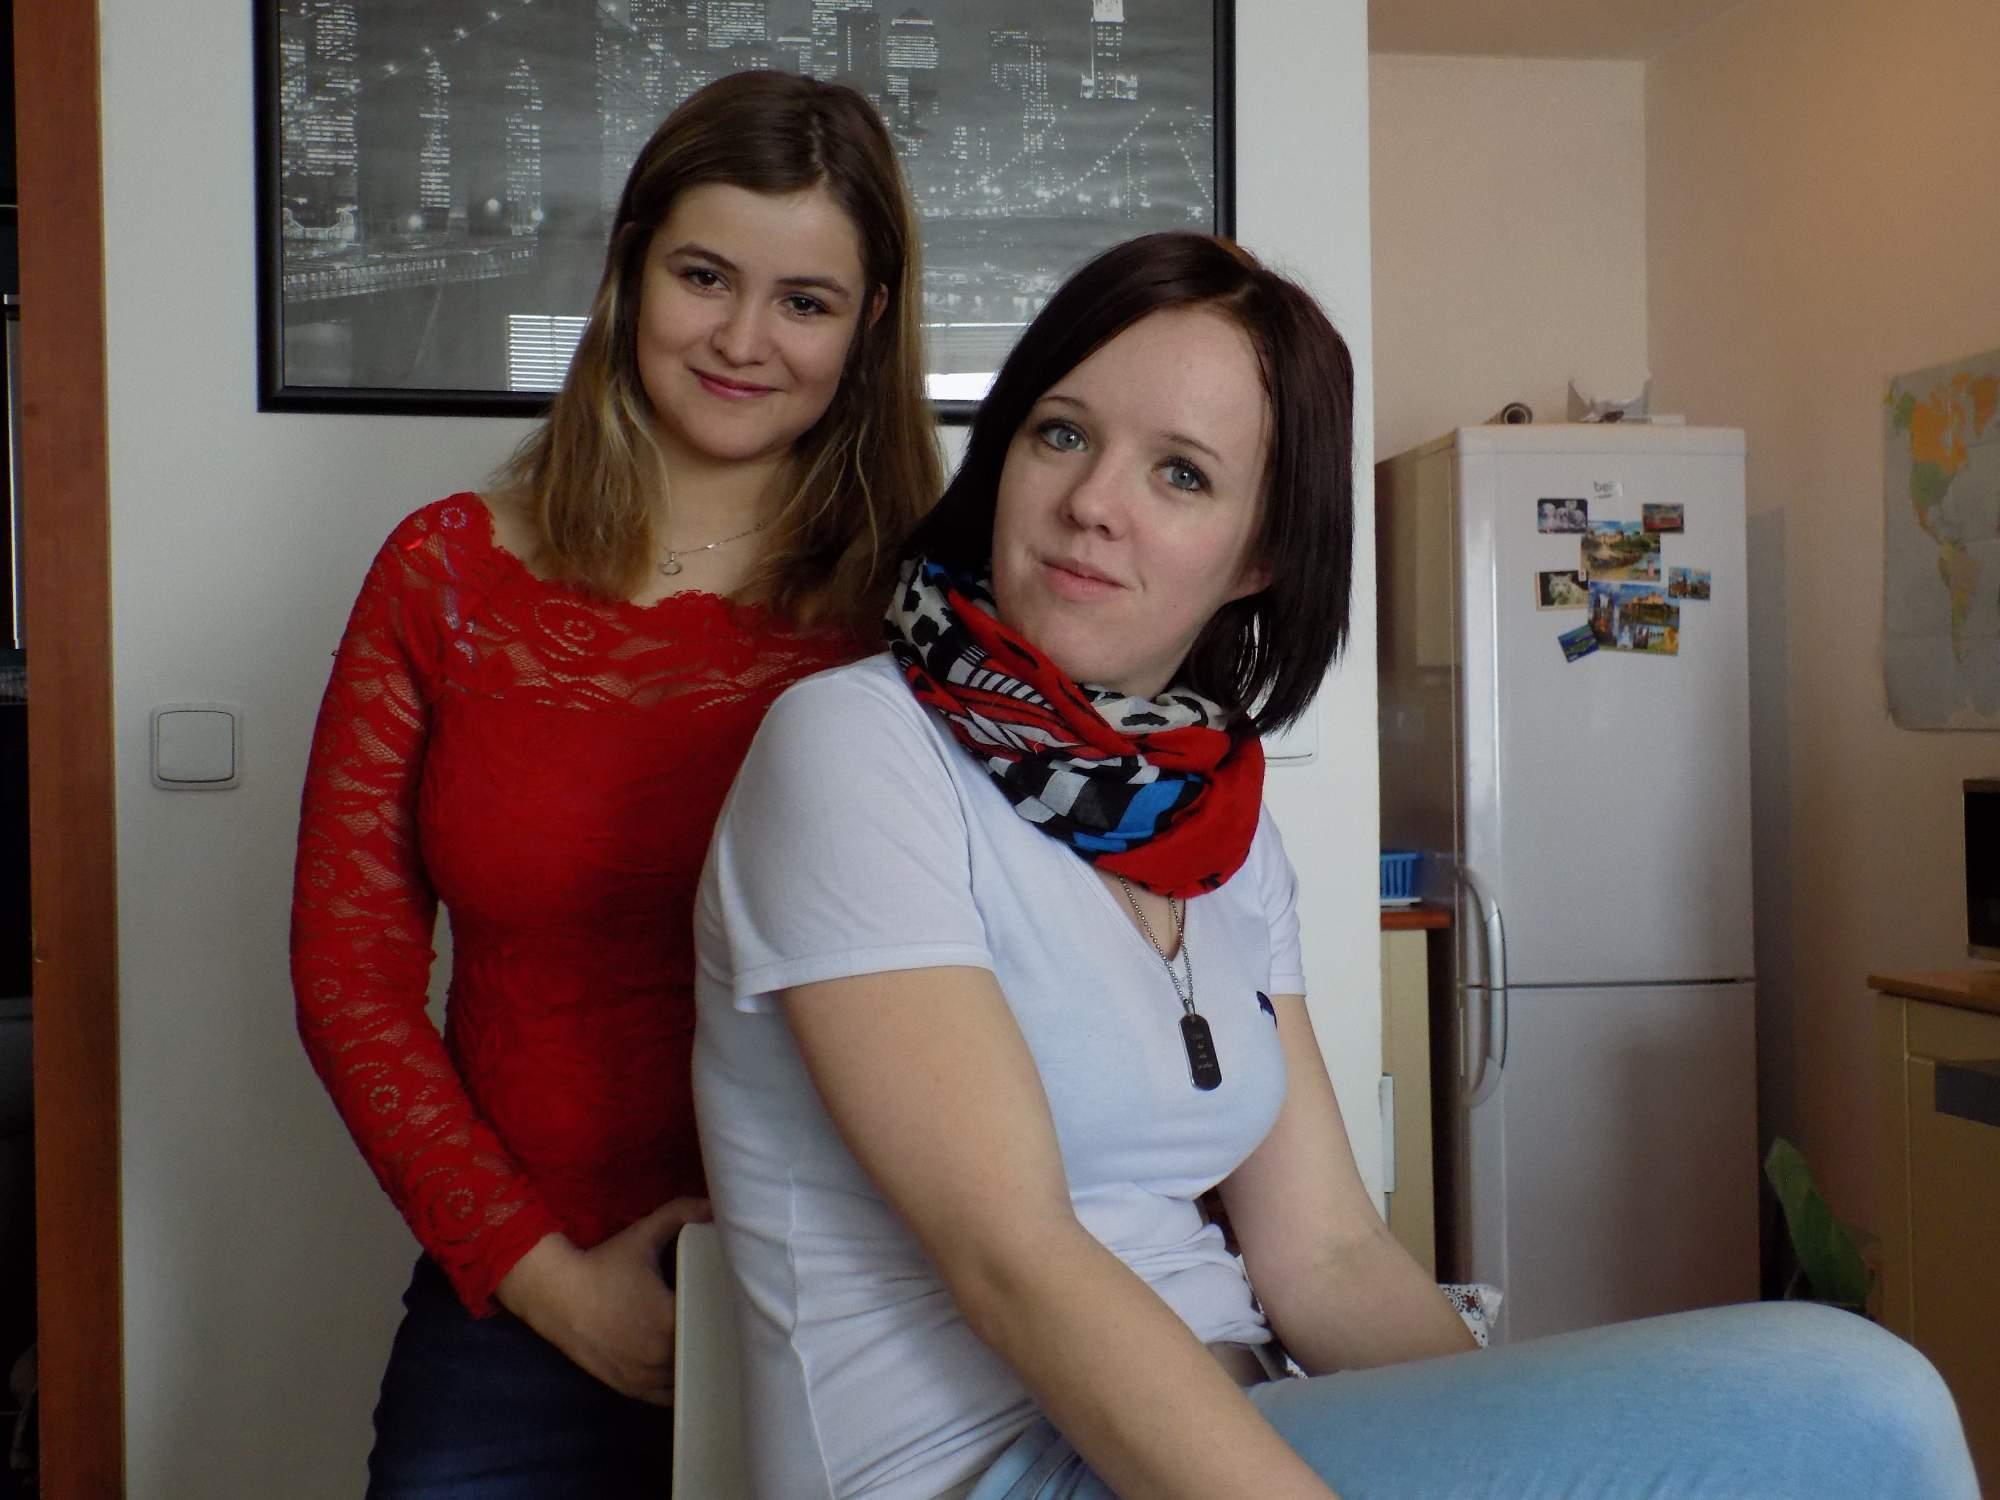 http://img25.rajce.idnes.cz/d2502/13/13862/13862137_c5559384bb63a400f5d8327efbaafba8/images/DSCN1501.jpg